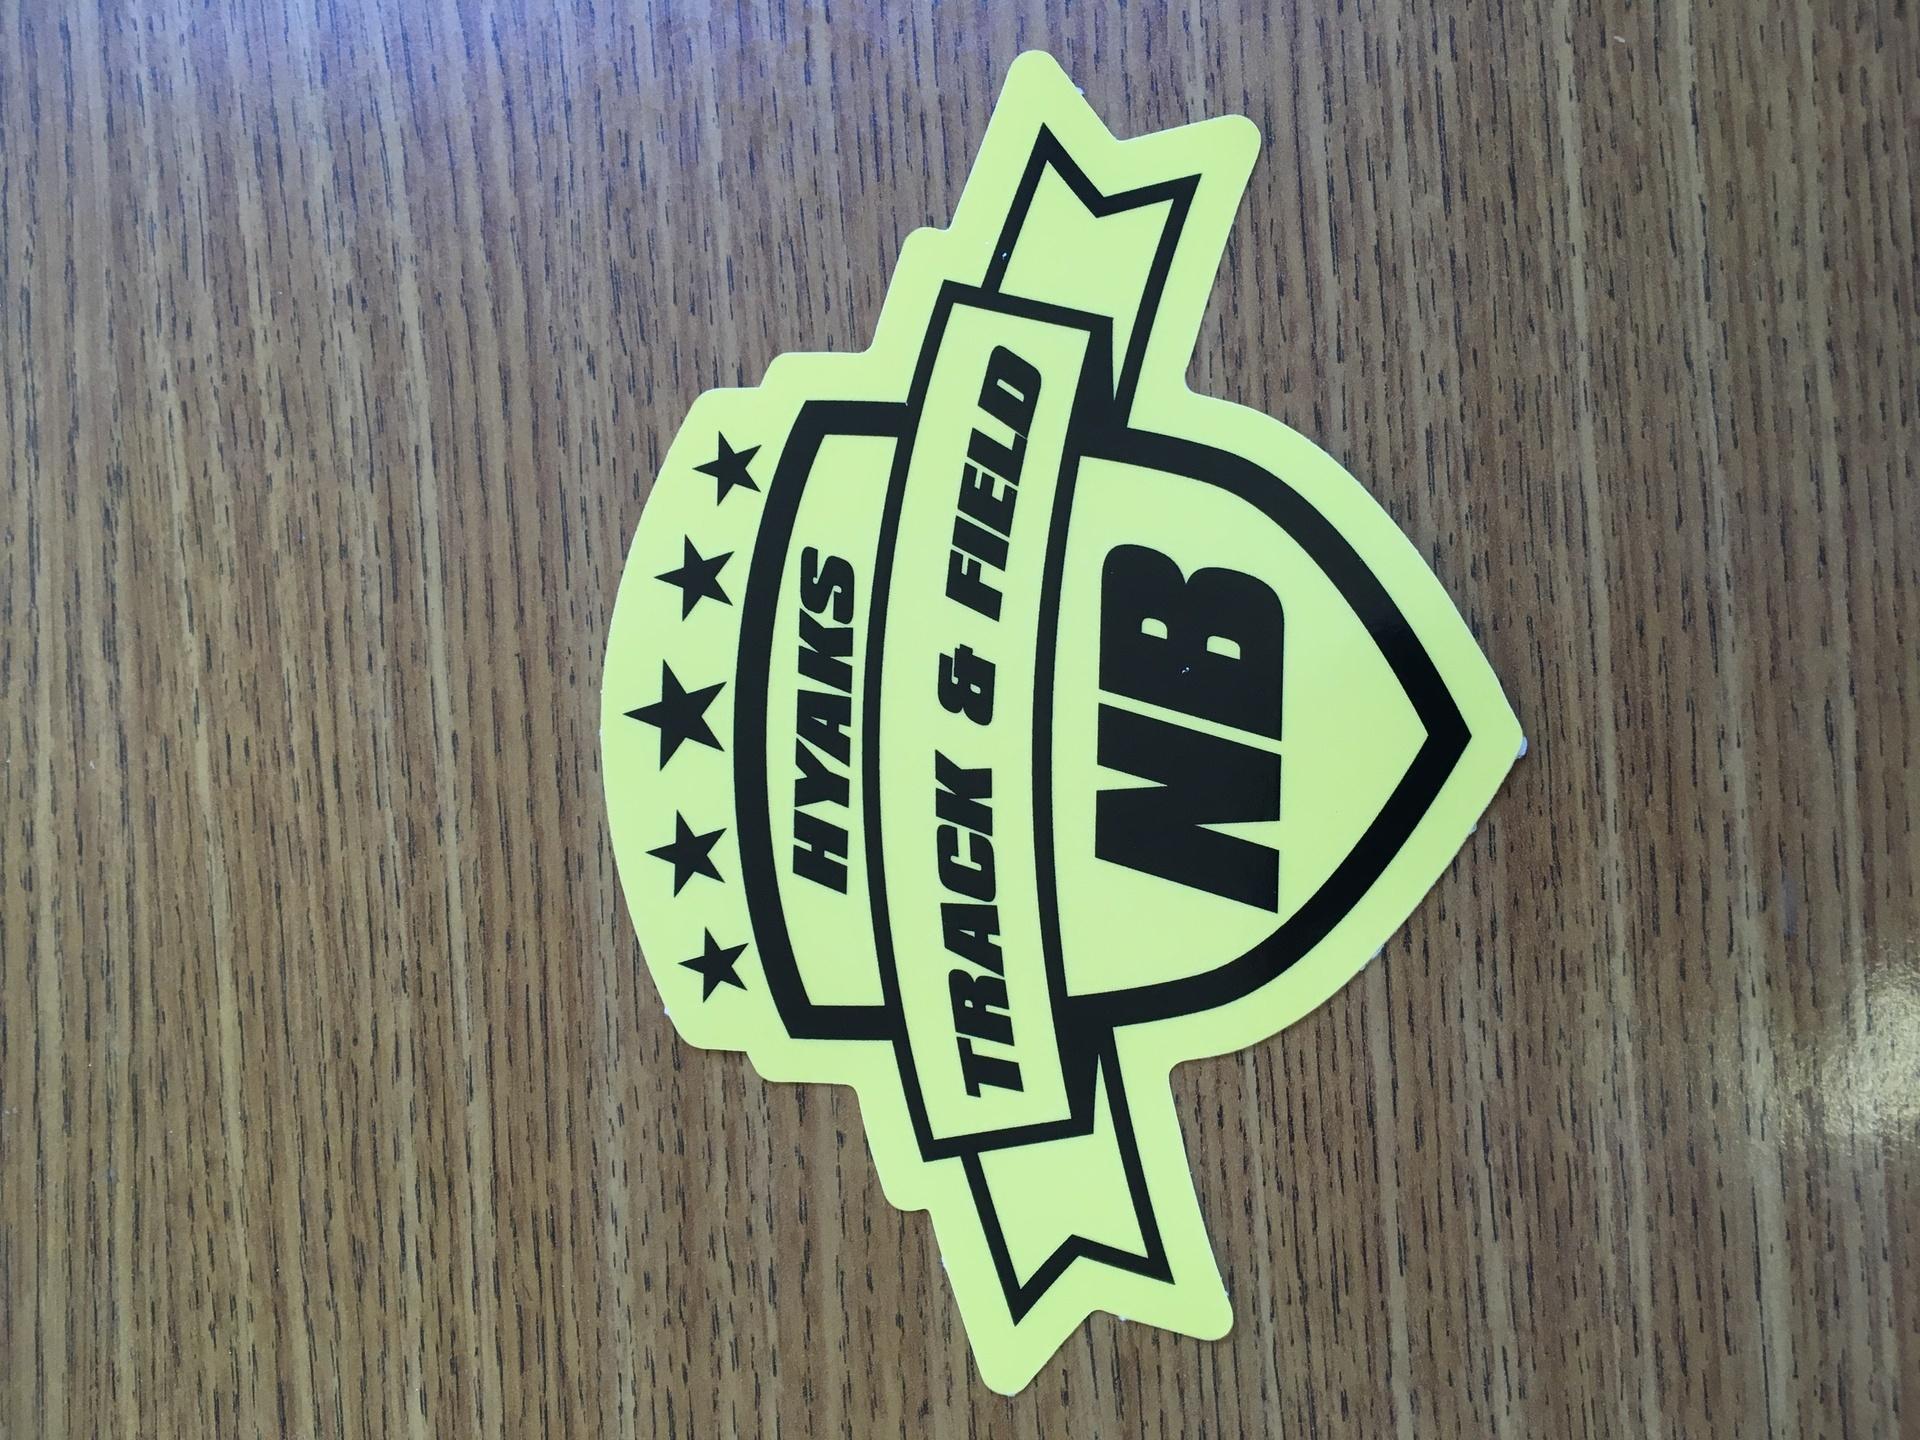 Peter's photograph of their Custom Women's Track Sprinter Sticker